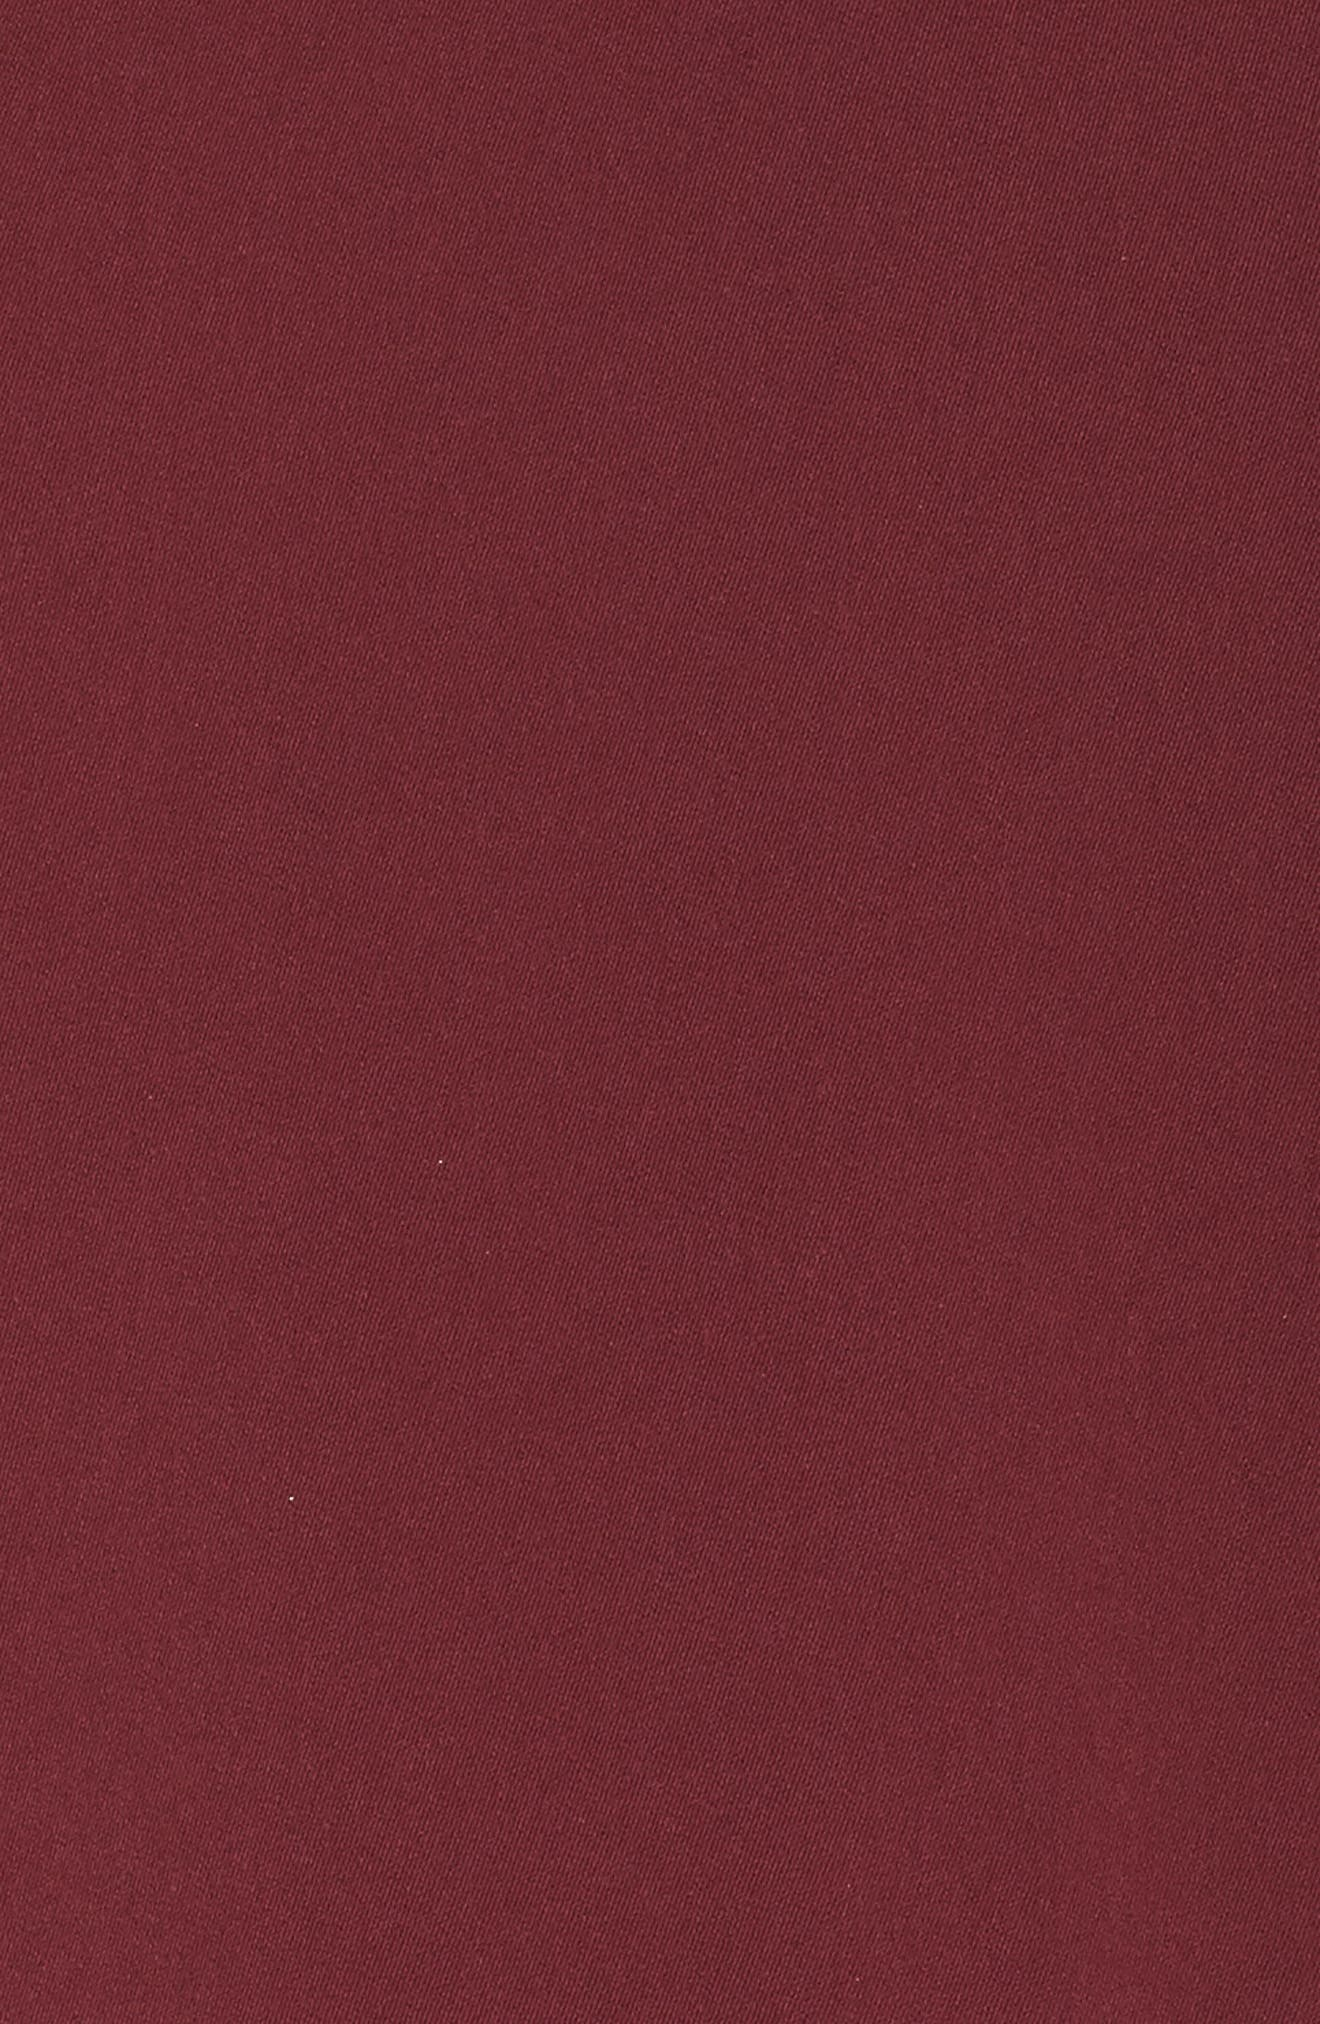 Off the Shoulder Sheath Dress,                             Alternate thumbnail 10, color,